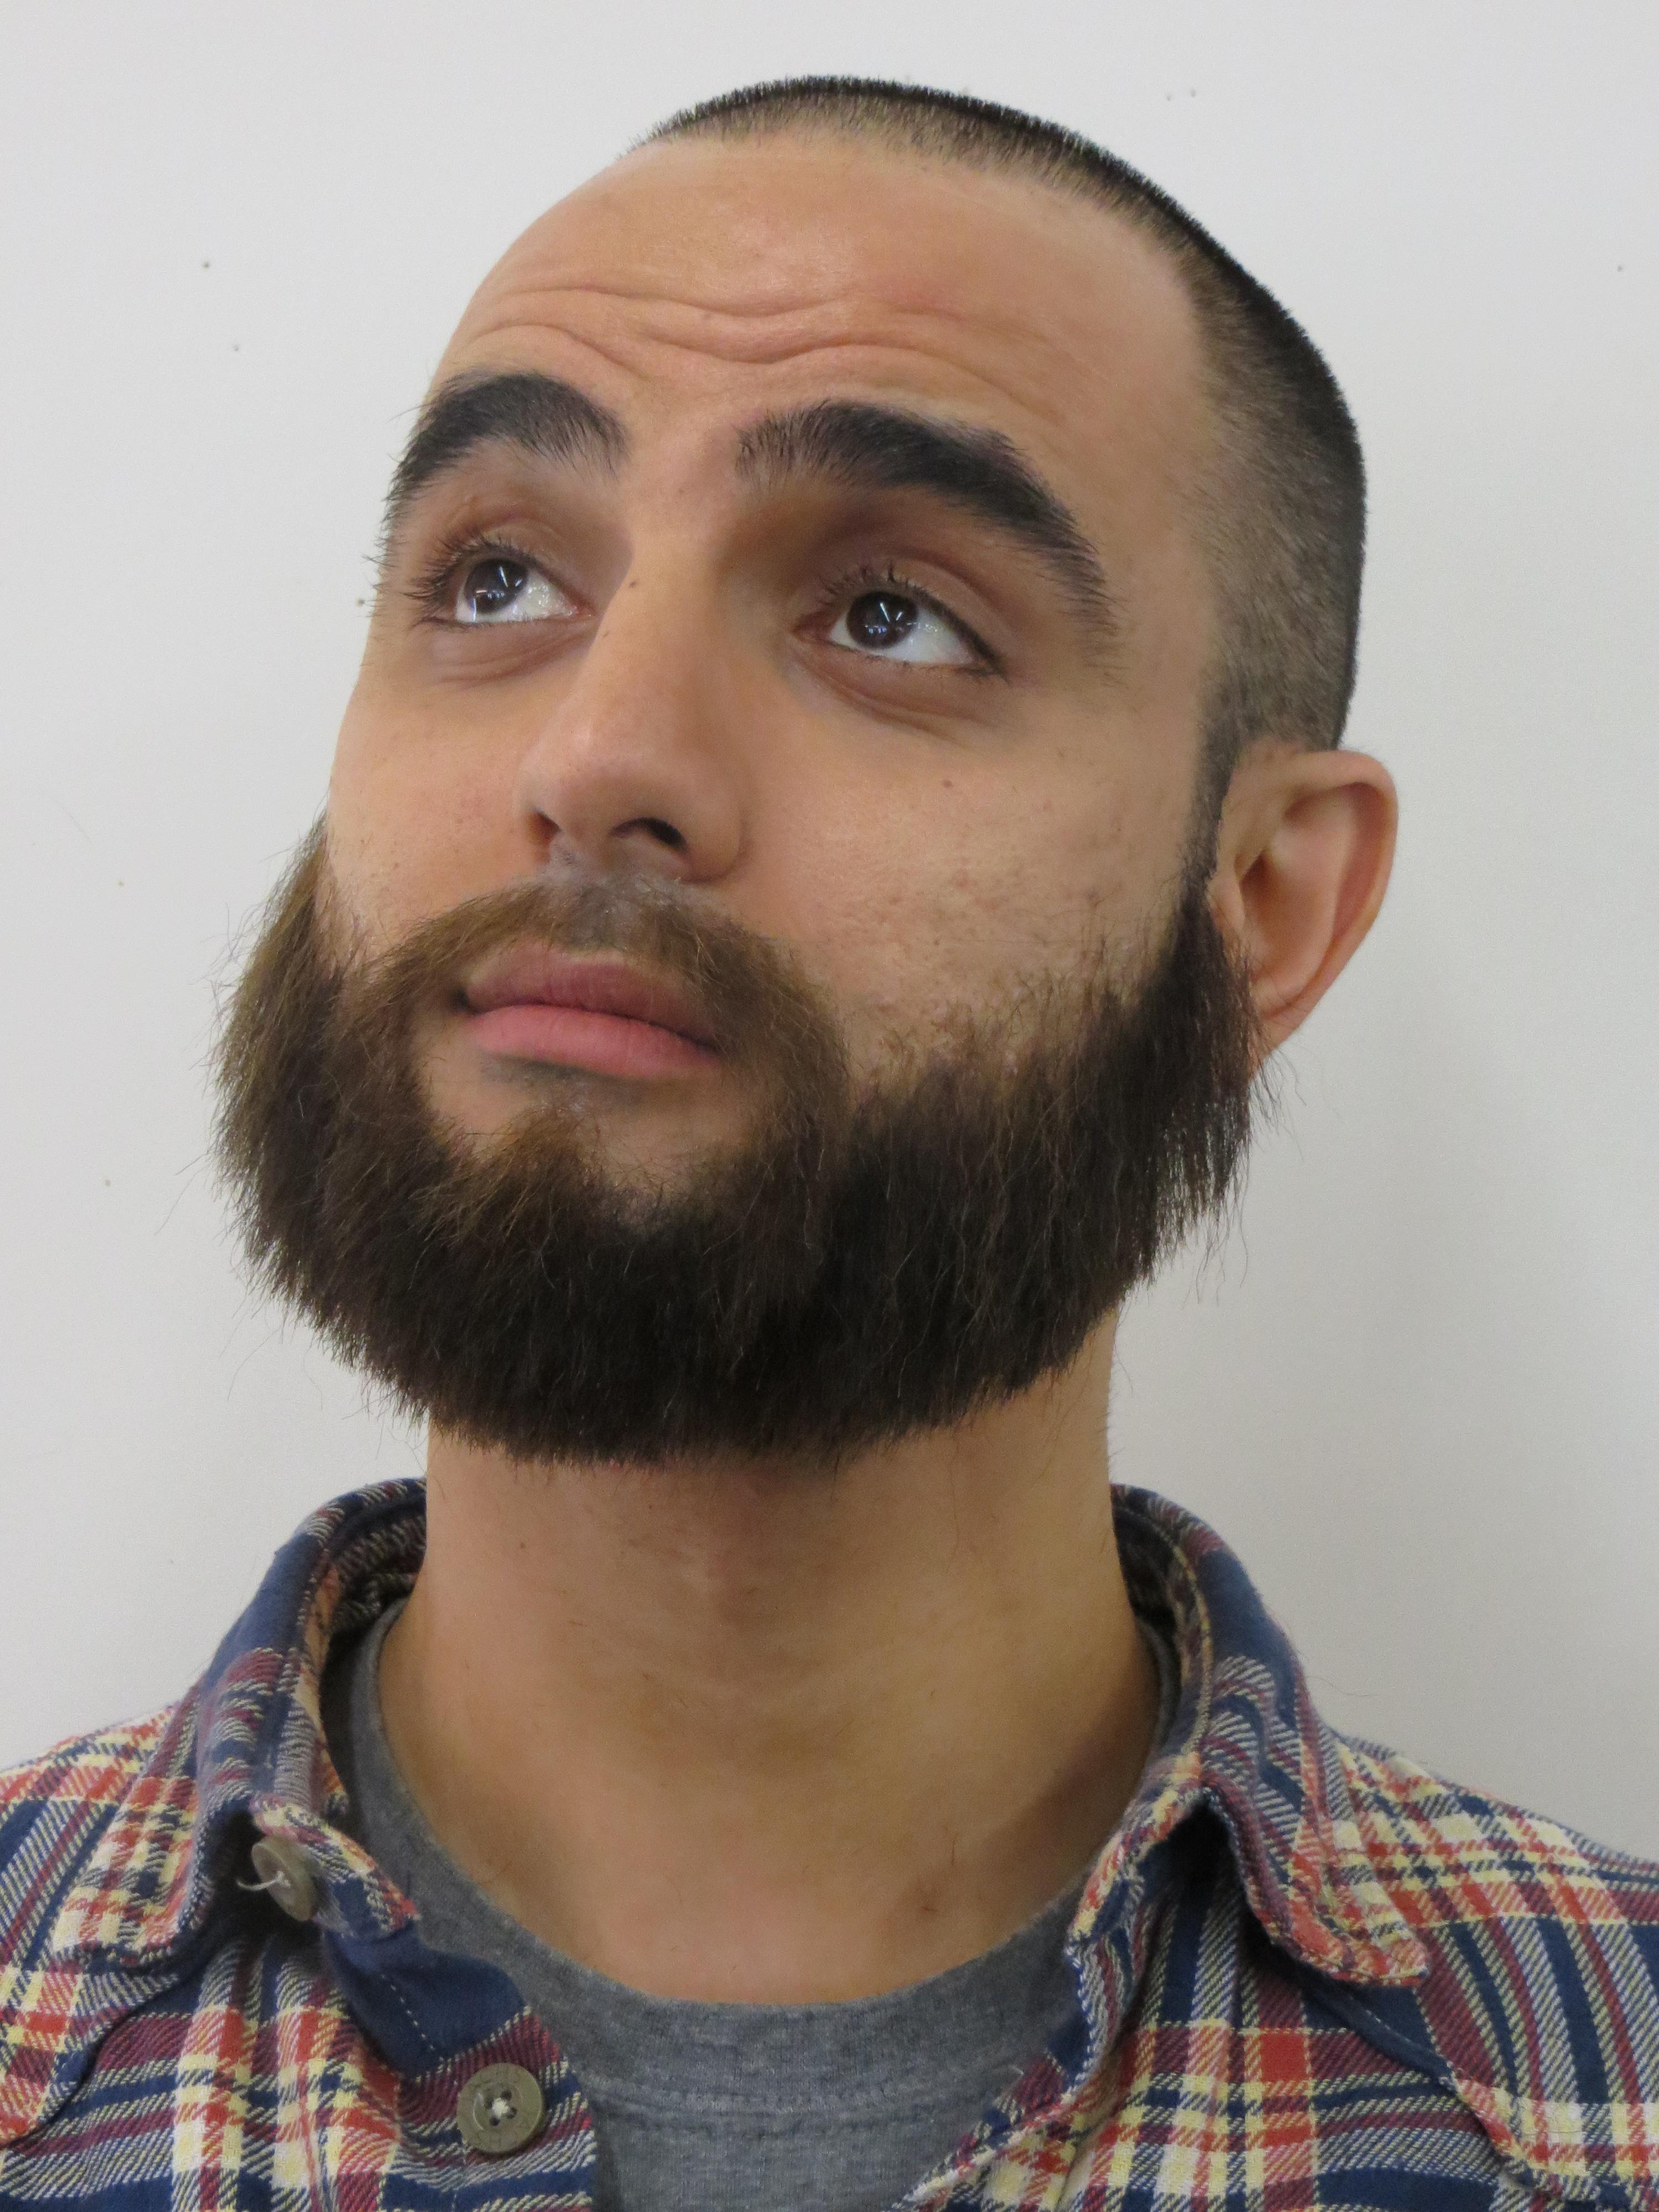 Handlaid Beard